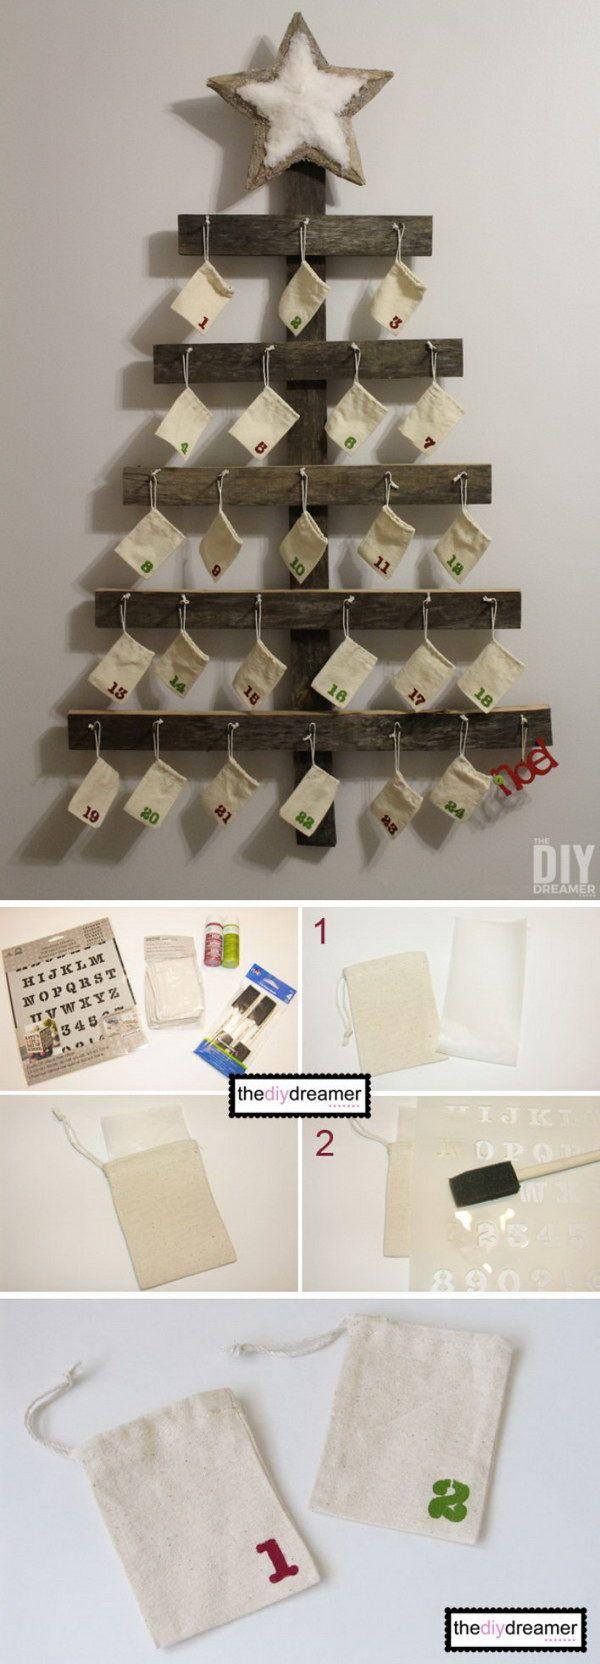 Calendar Diy Ideas : Diy rustic christmas decoration ideas tutorials